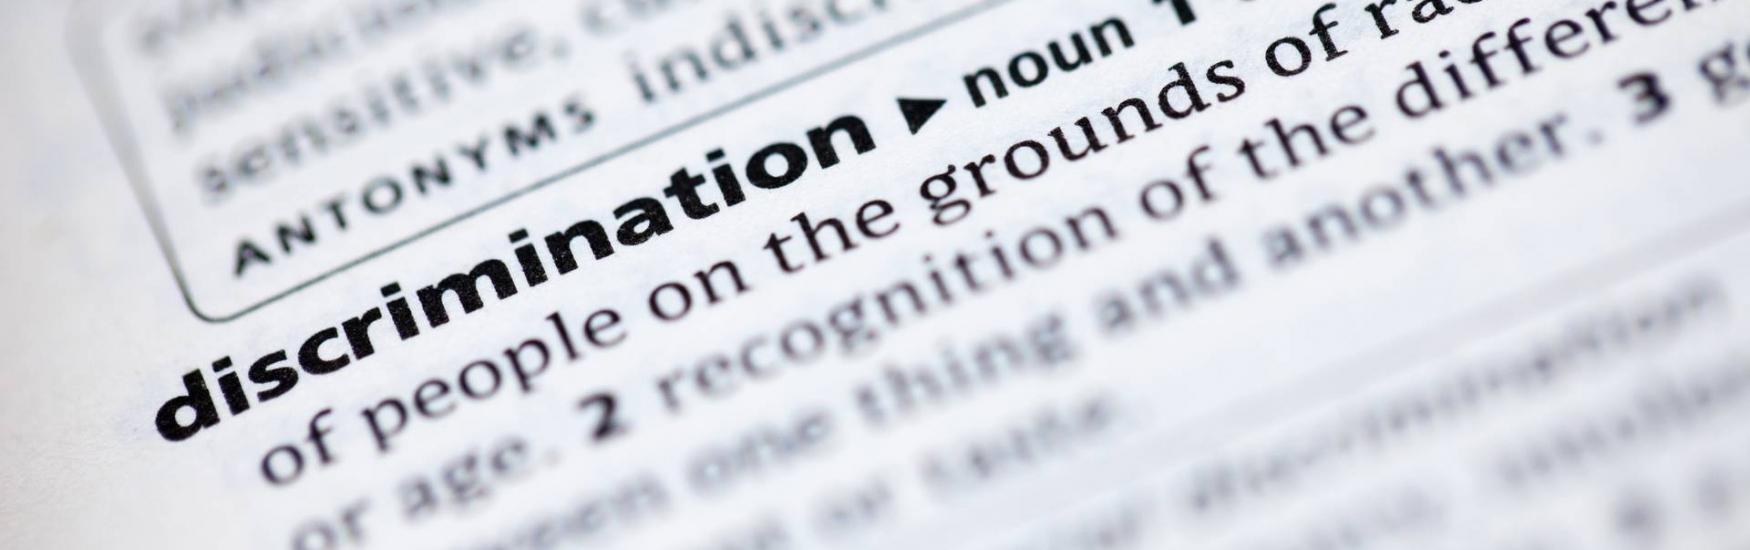 Discrimination news